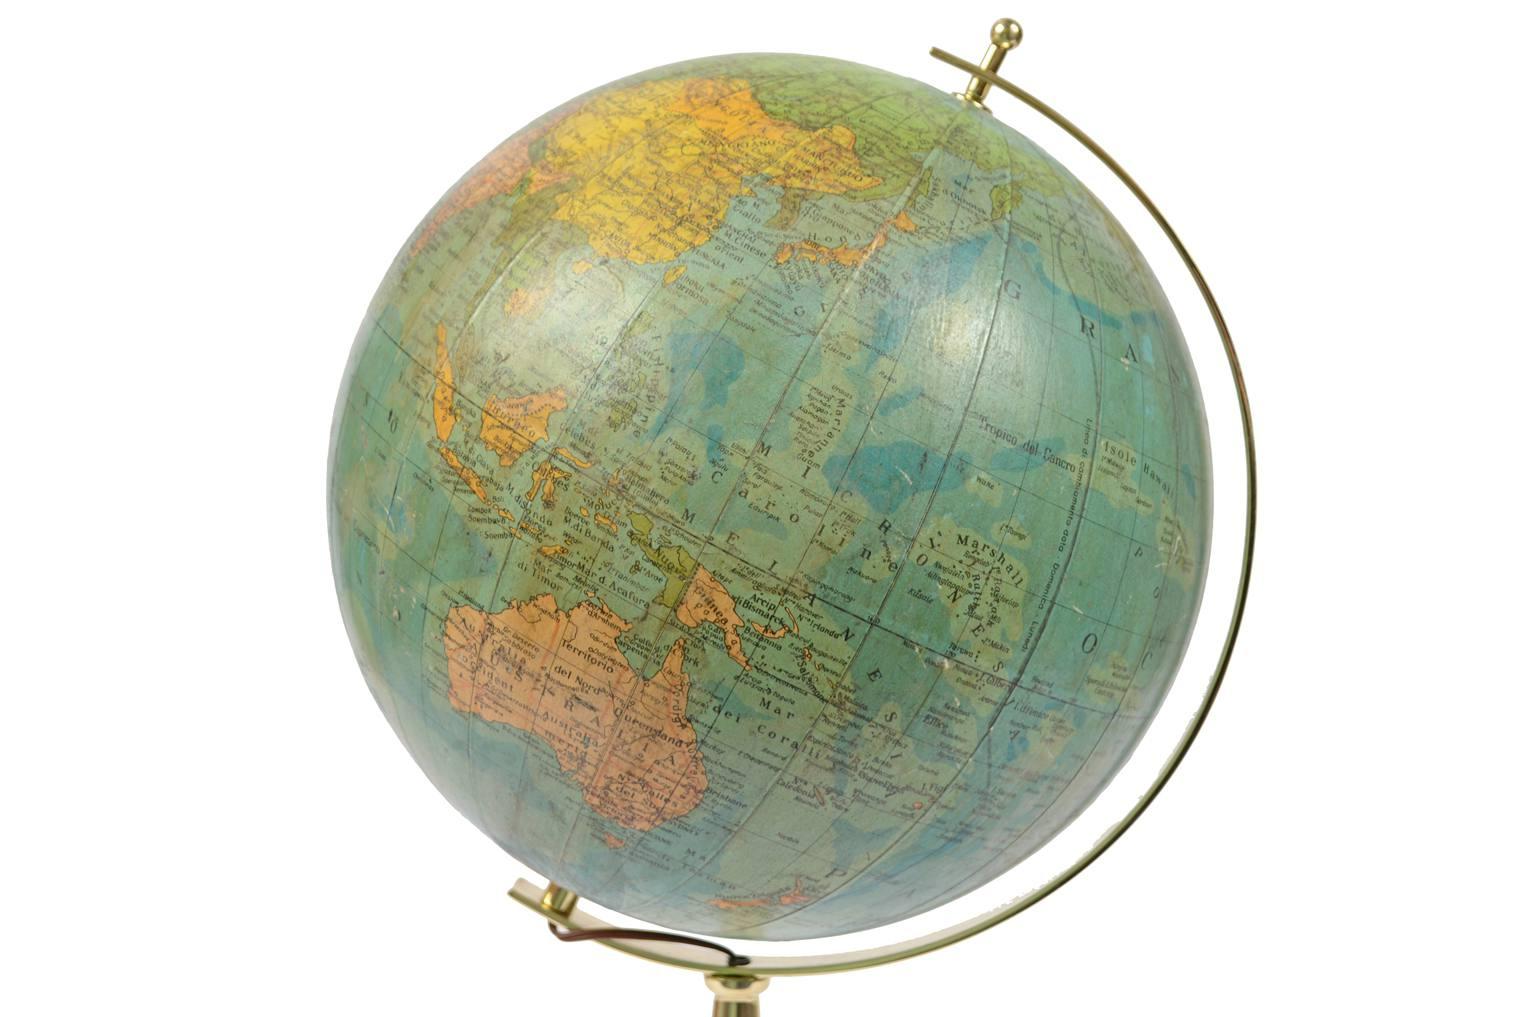 Globi-mappamondi antichi/6239-Globo con luce